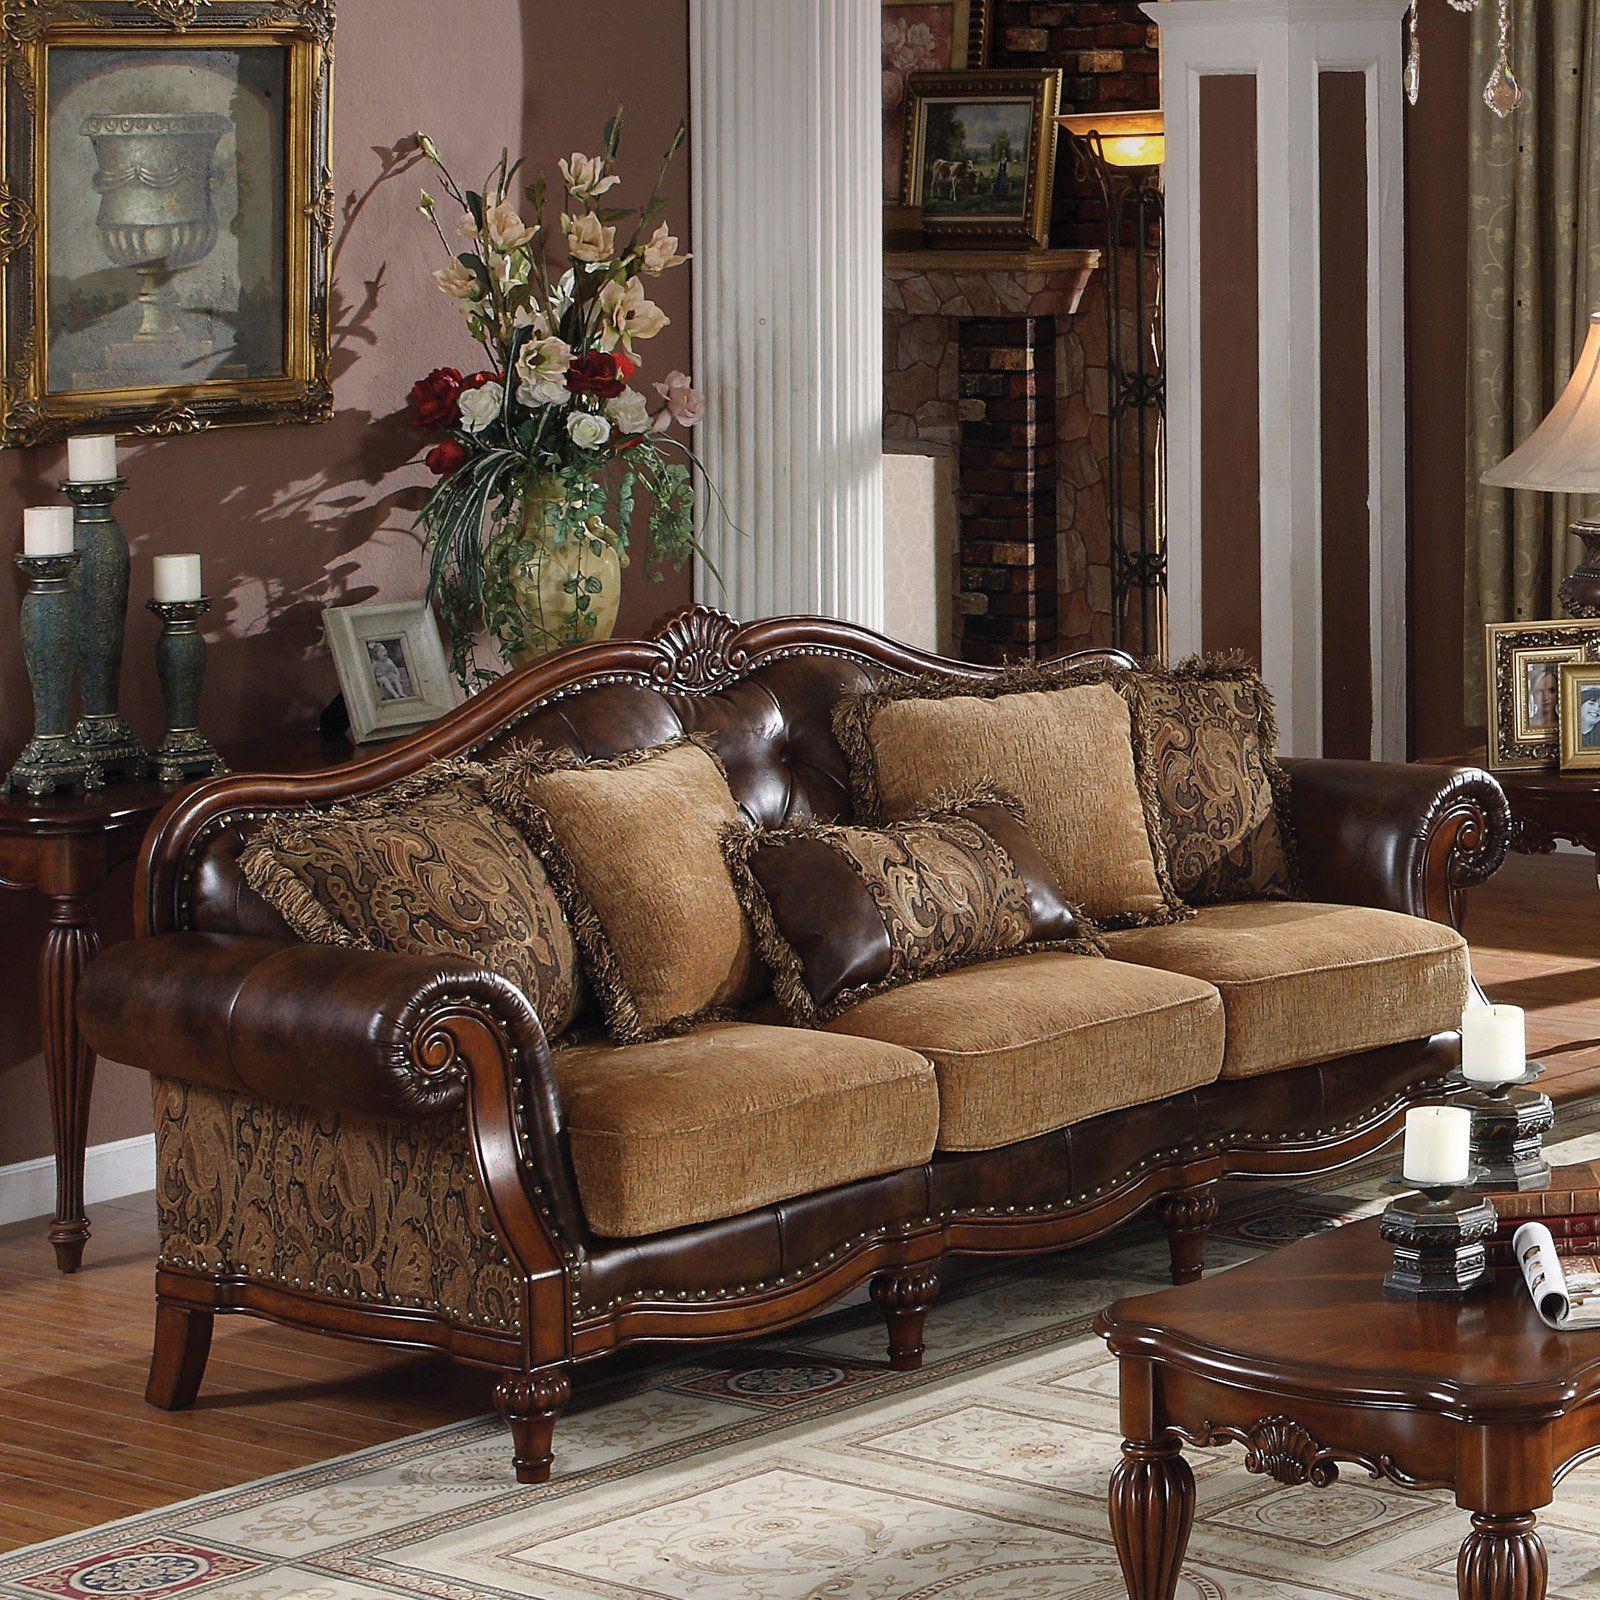 Acme Furniture Dreena Sofa With 5 Pillows Luxury Sofa